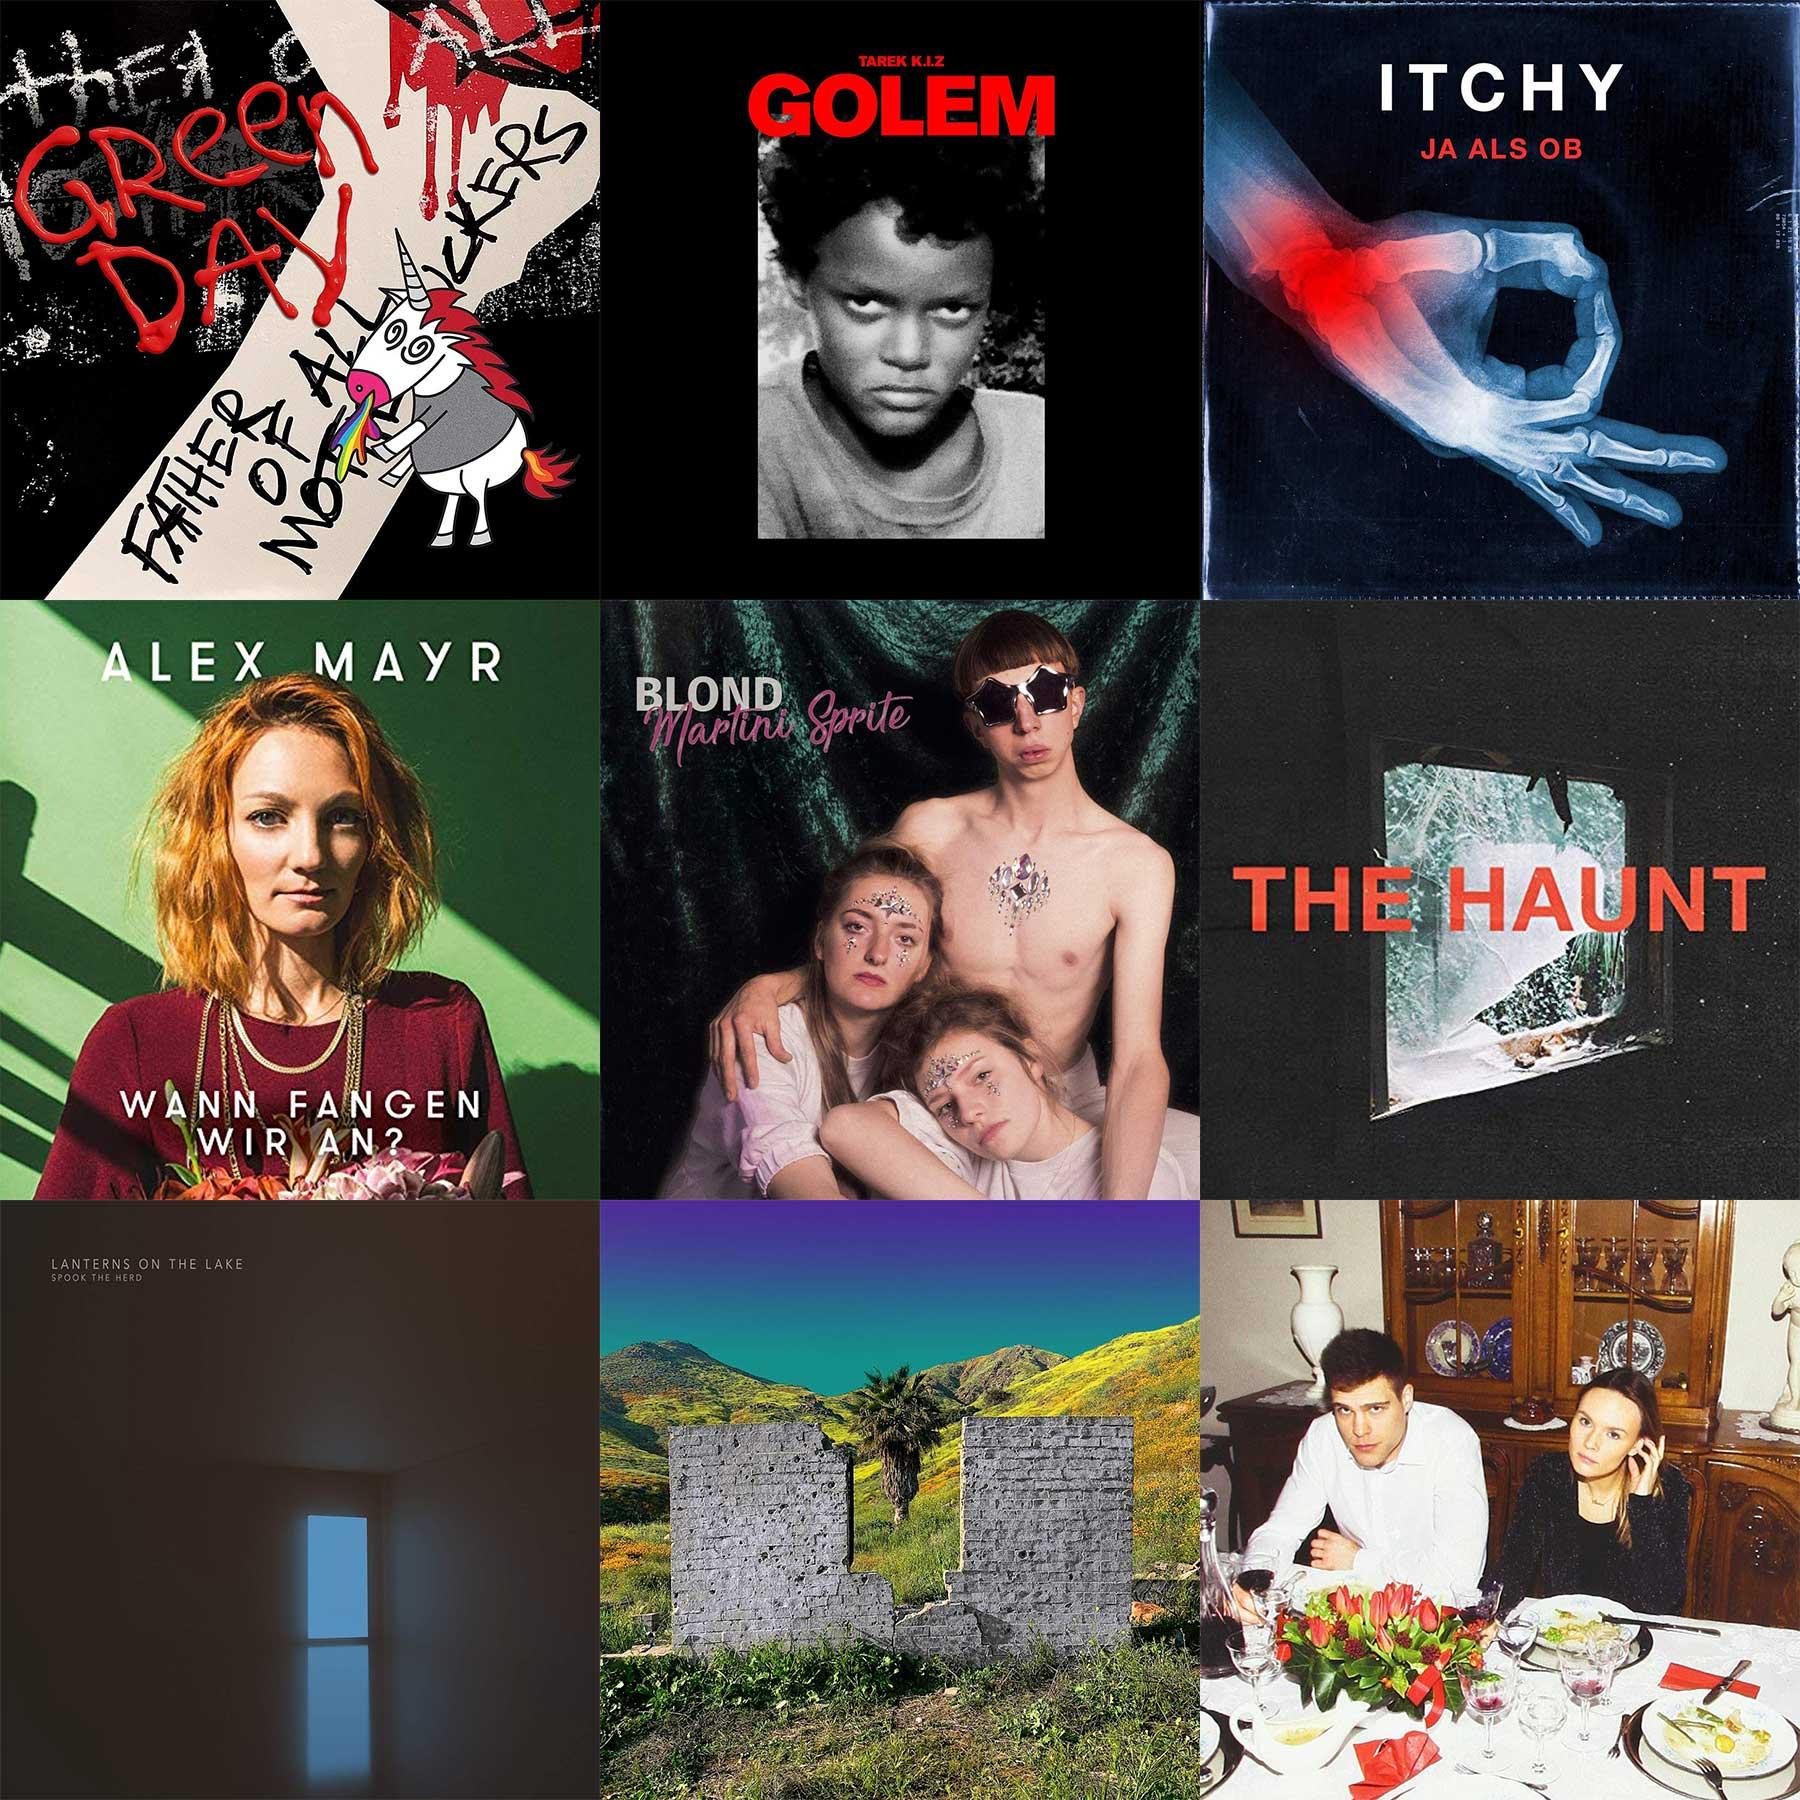 Kurzreviews: Neue Musikalben im Februar 2020 neue-musikalben-februar-2020-kurzreviews-thumb